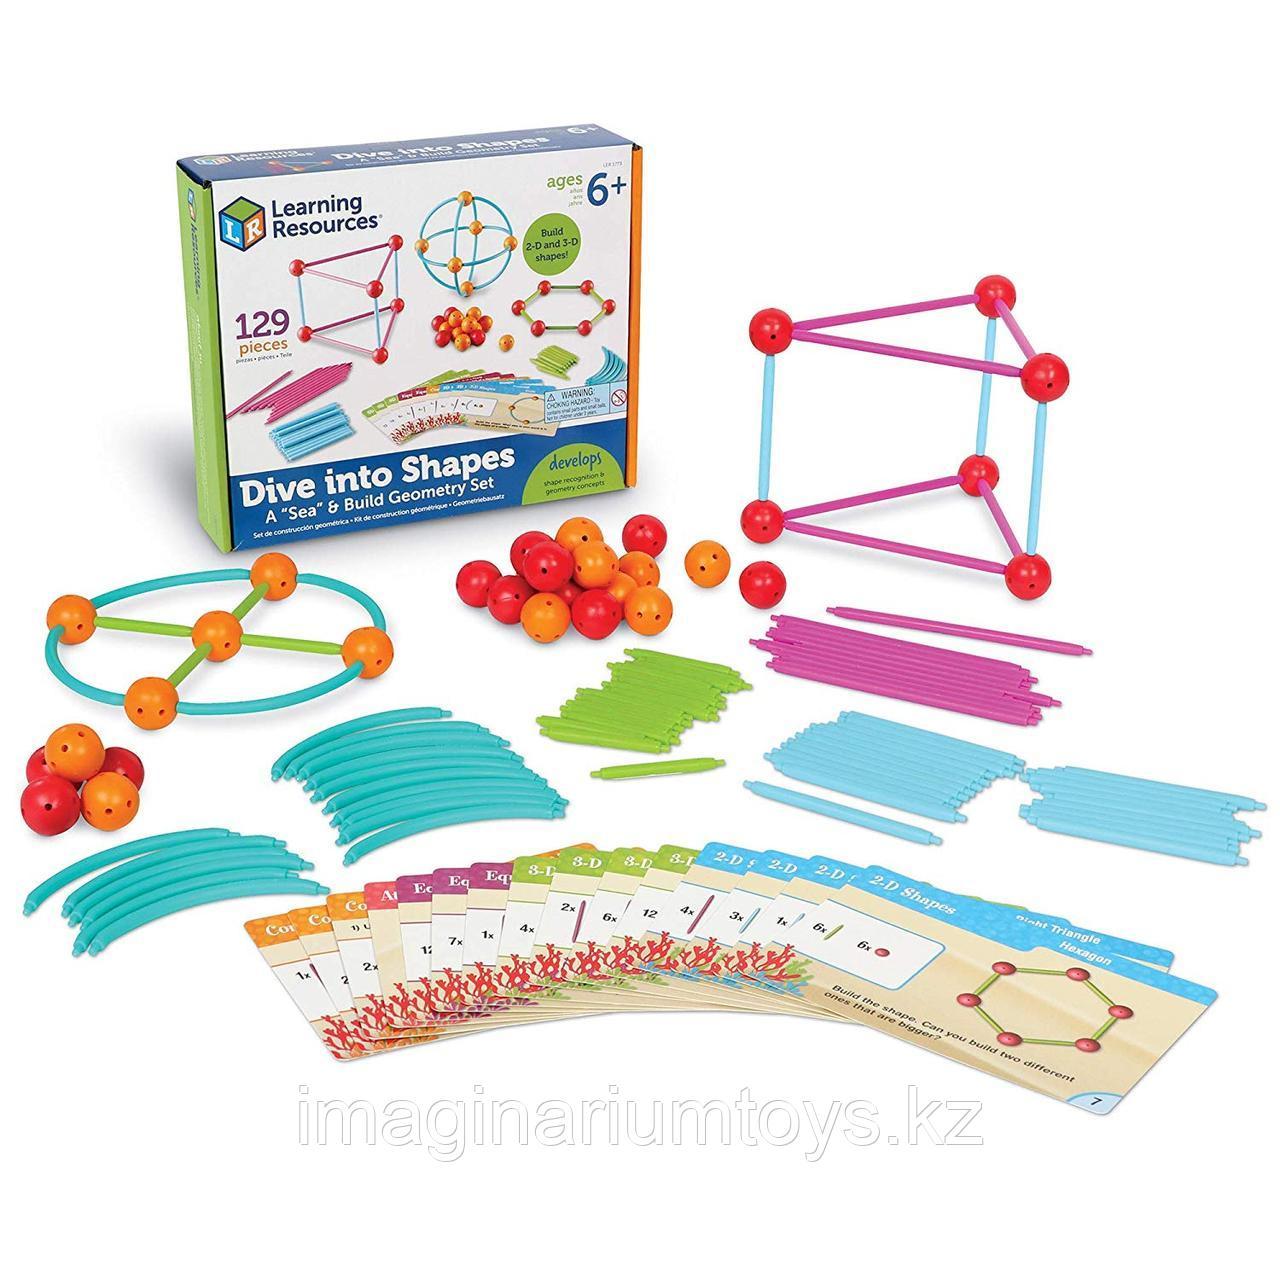 Развивающий набор «Погружение в геометрию» Learning Resources